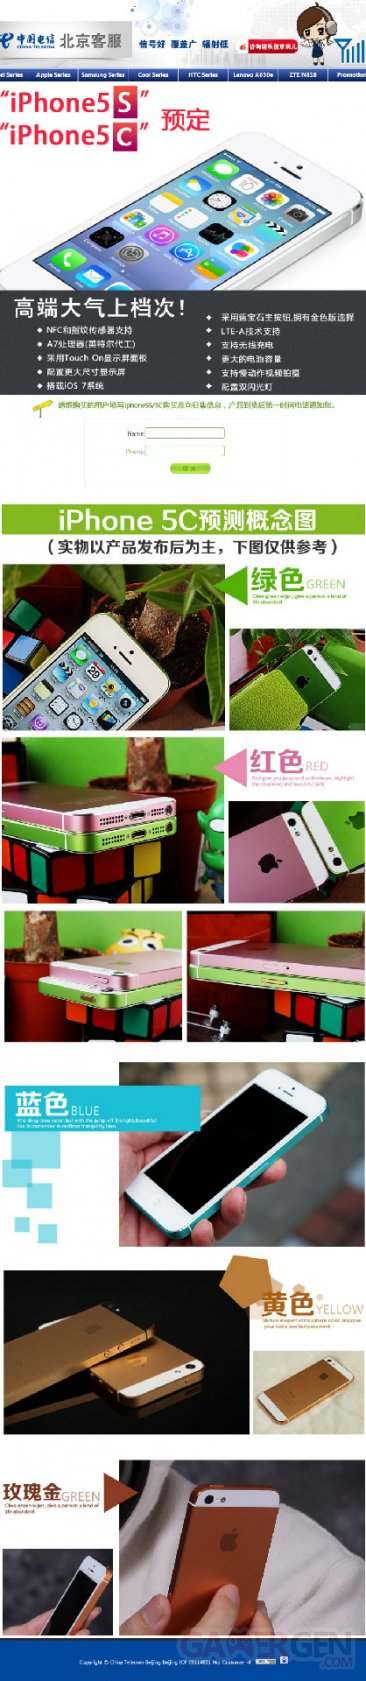 iPhone-5C-China-Telecom